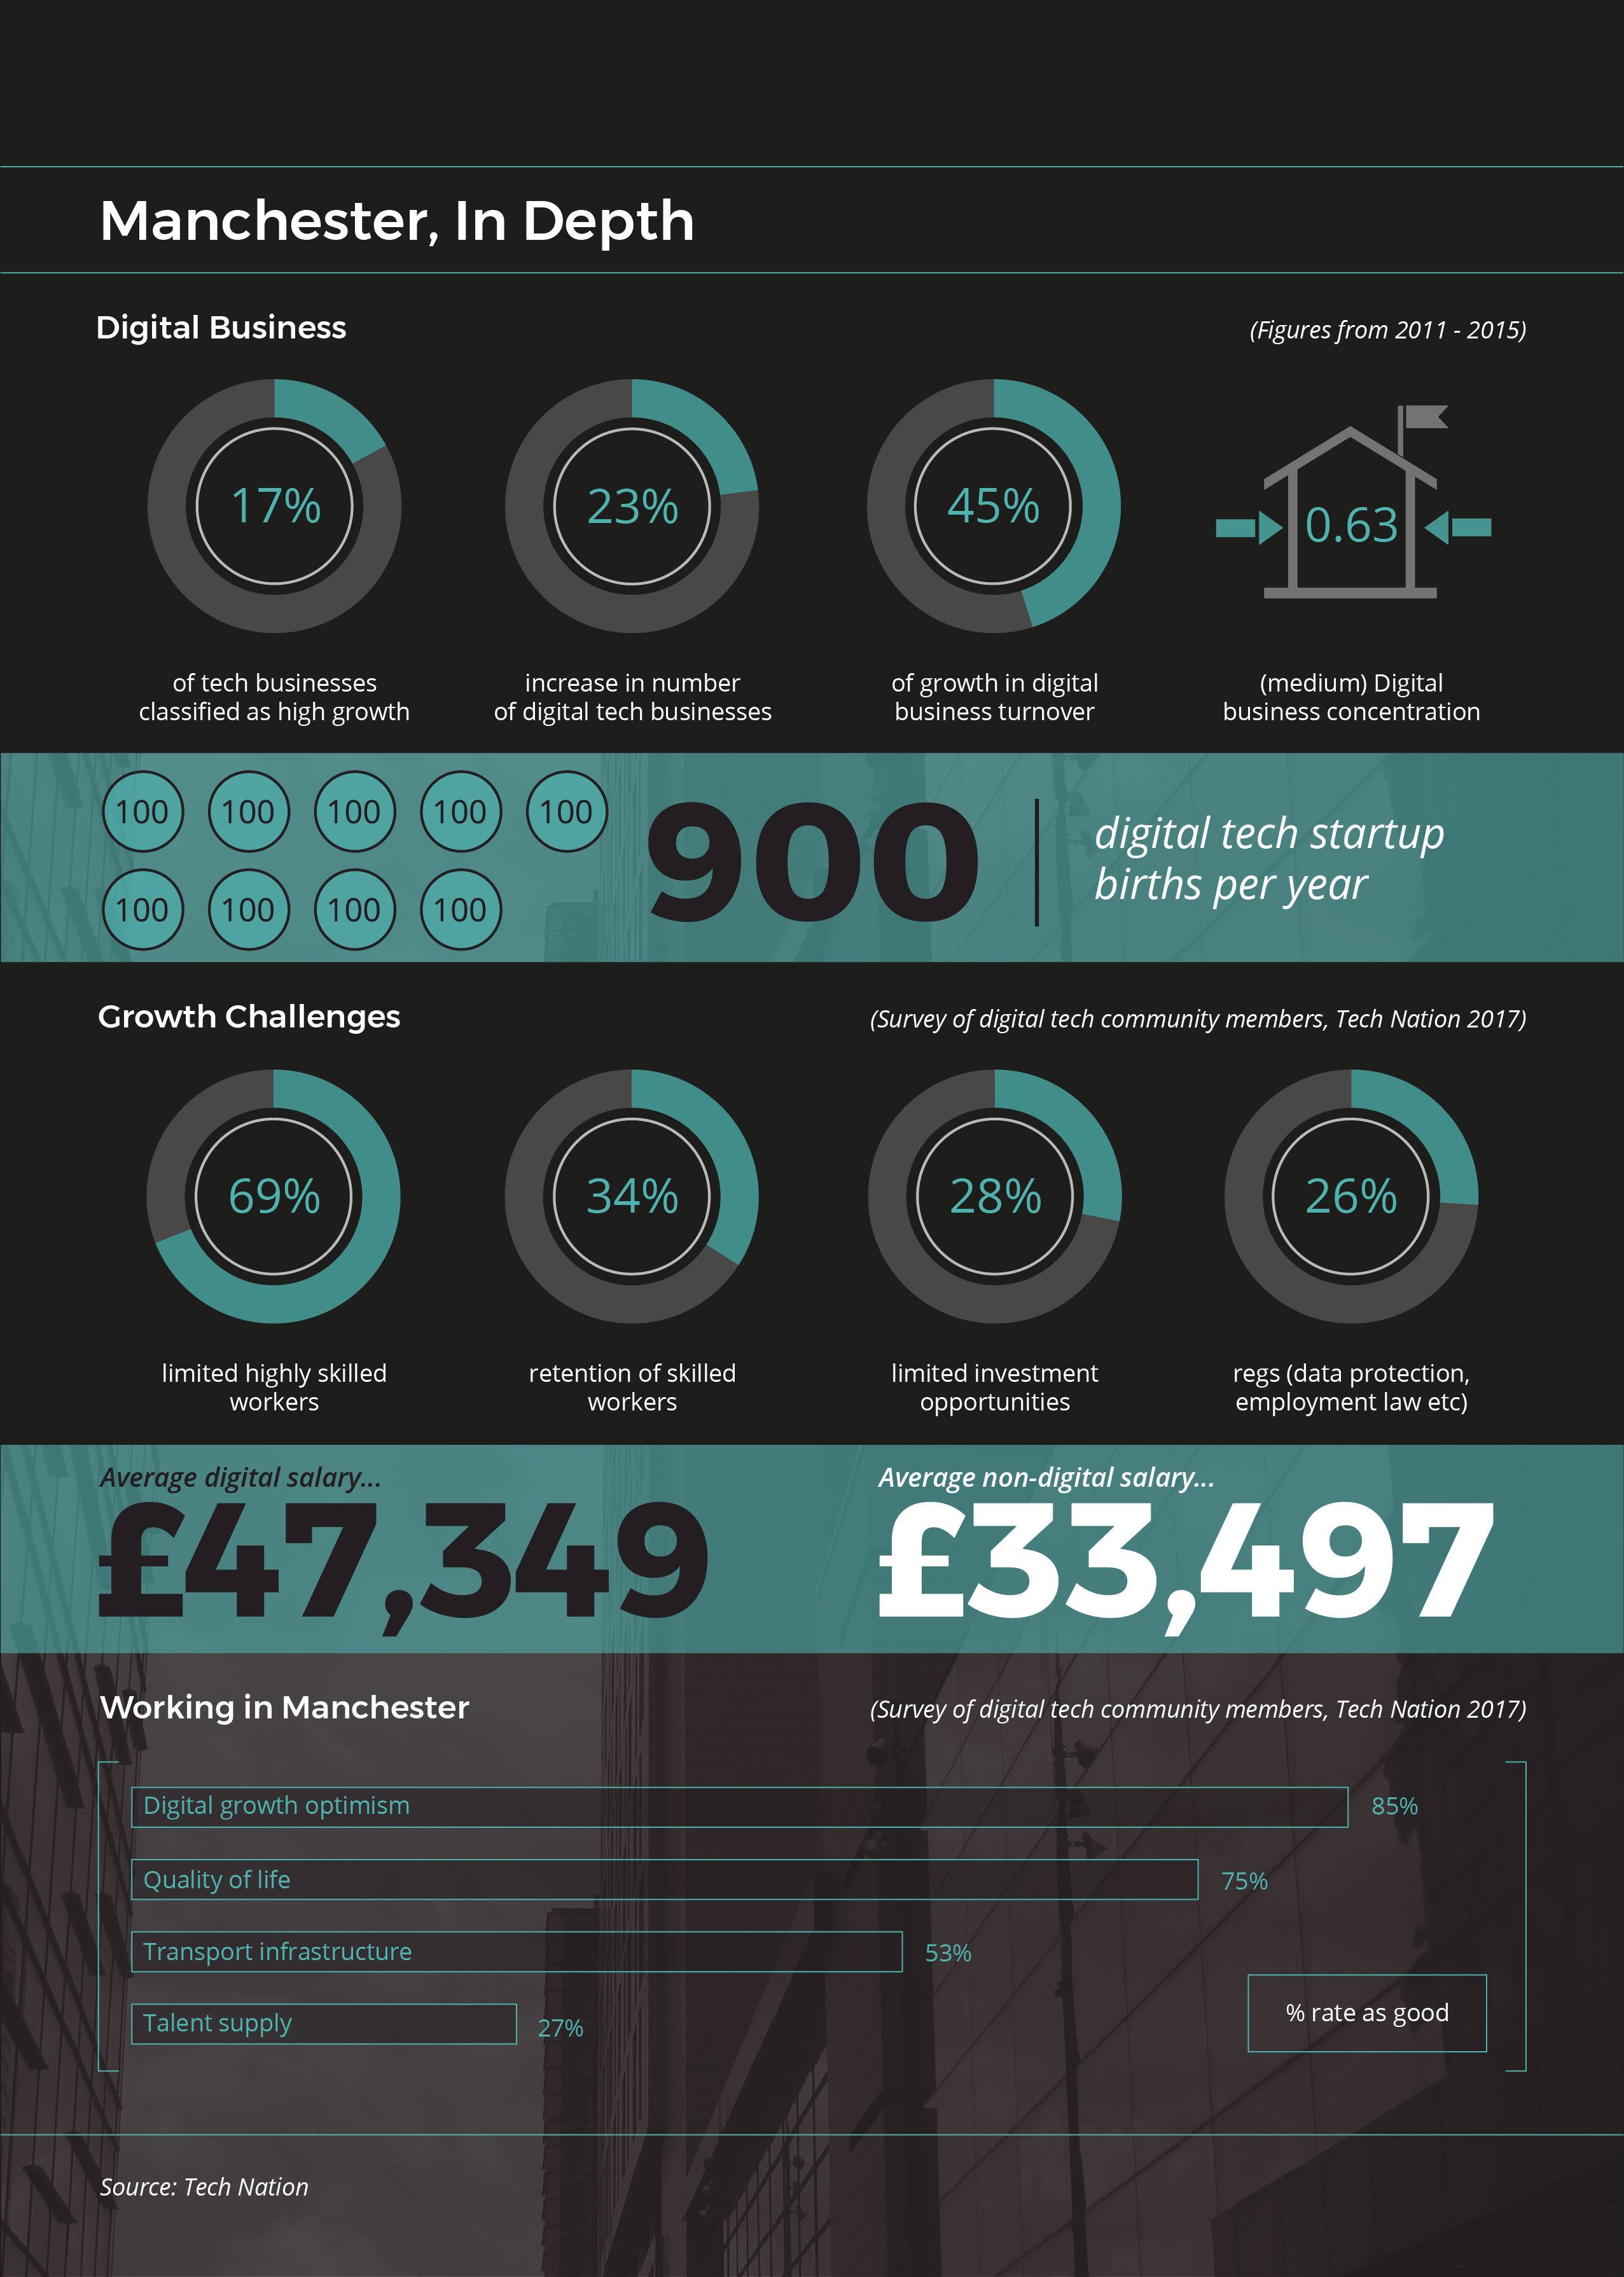 Manchester Digital Economy - In Depth